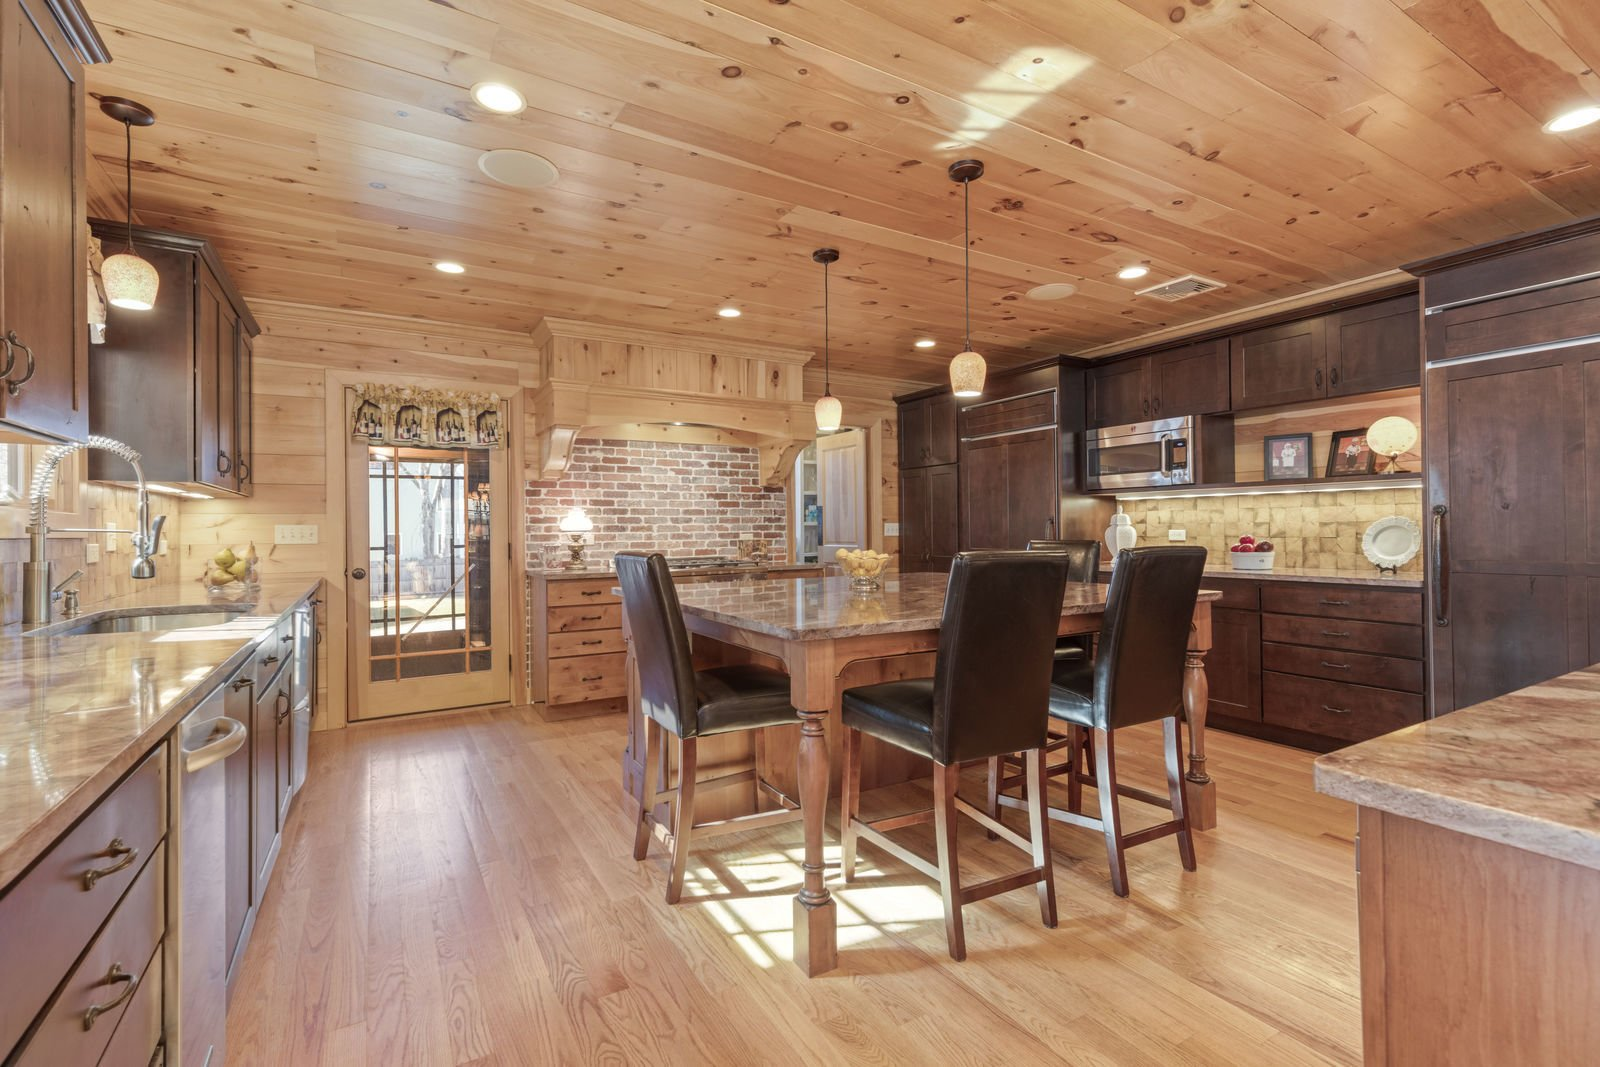 Kitchen, Recessed Lighting, Dishwasher, Granite Counter, Medium Hardwood Floor, Wood Cabinet, Refrigerator, Ceiling Lighting, and Undermount Sink  Shingle Style Rustic Chic